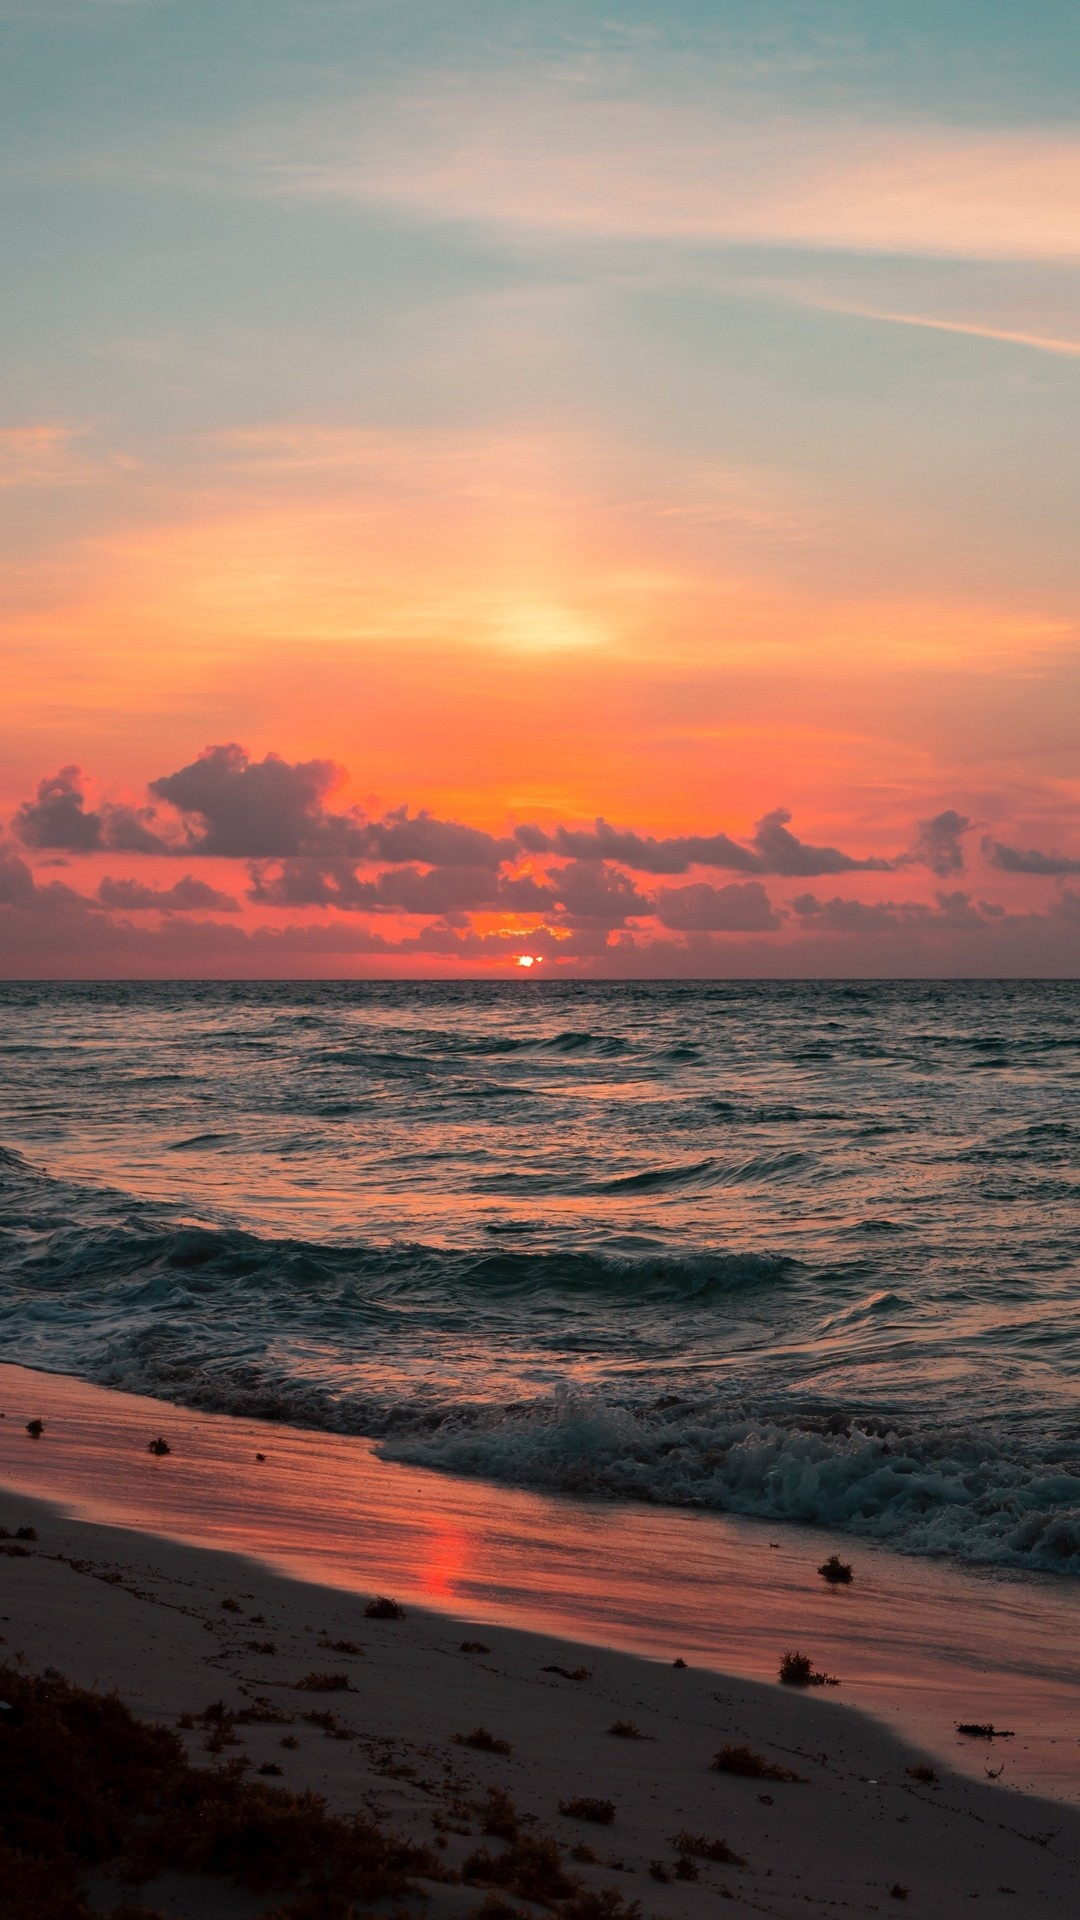 Sunrise iPhone 7 wallpaper